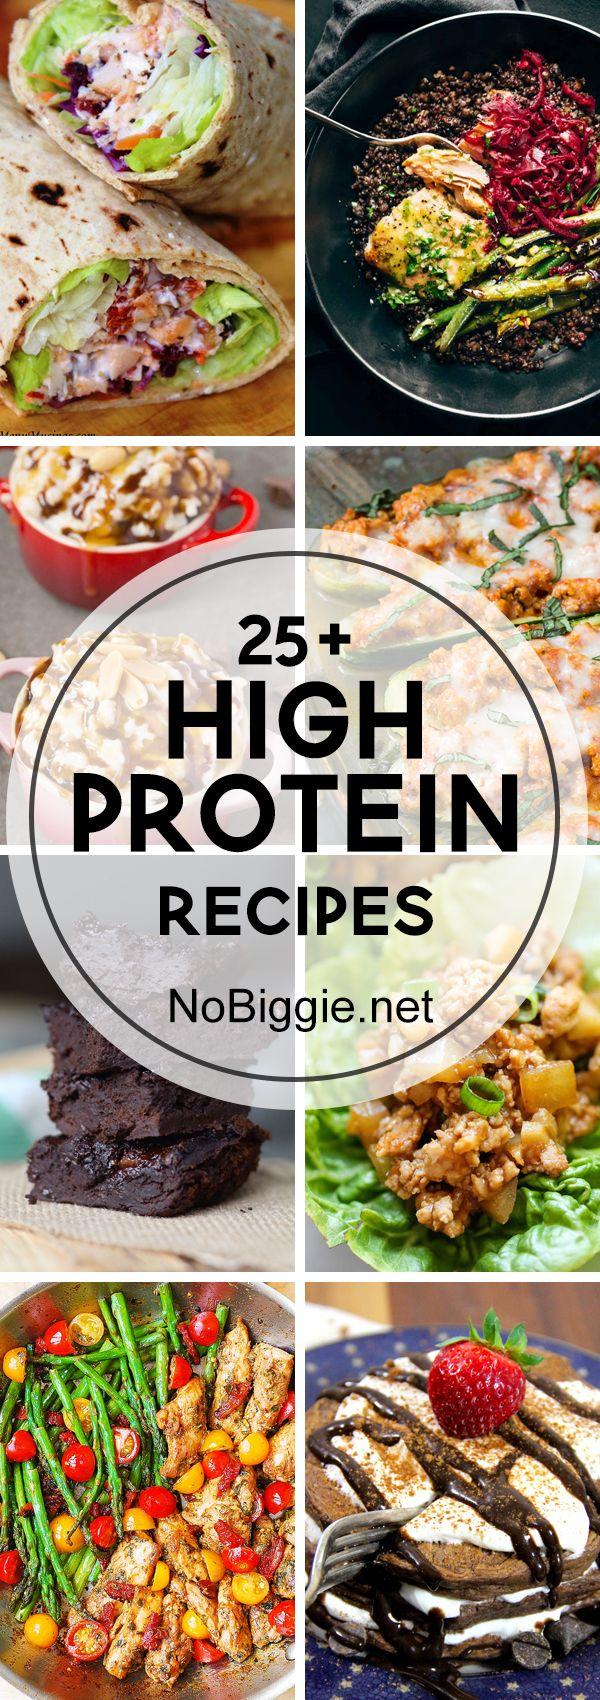 25+ High Protein Recipe | NoBiggie.net